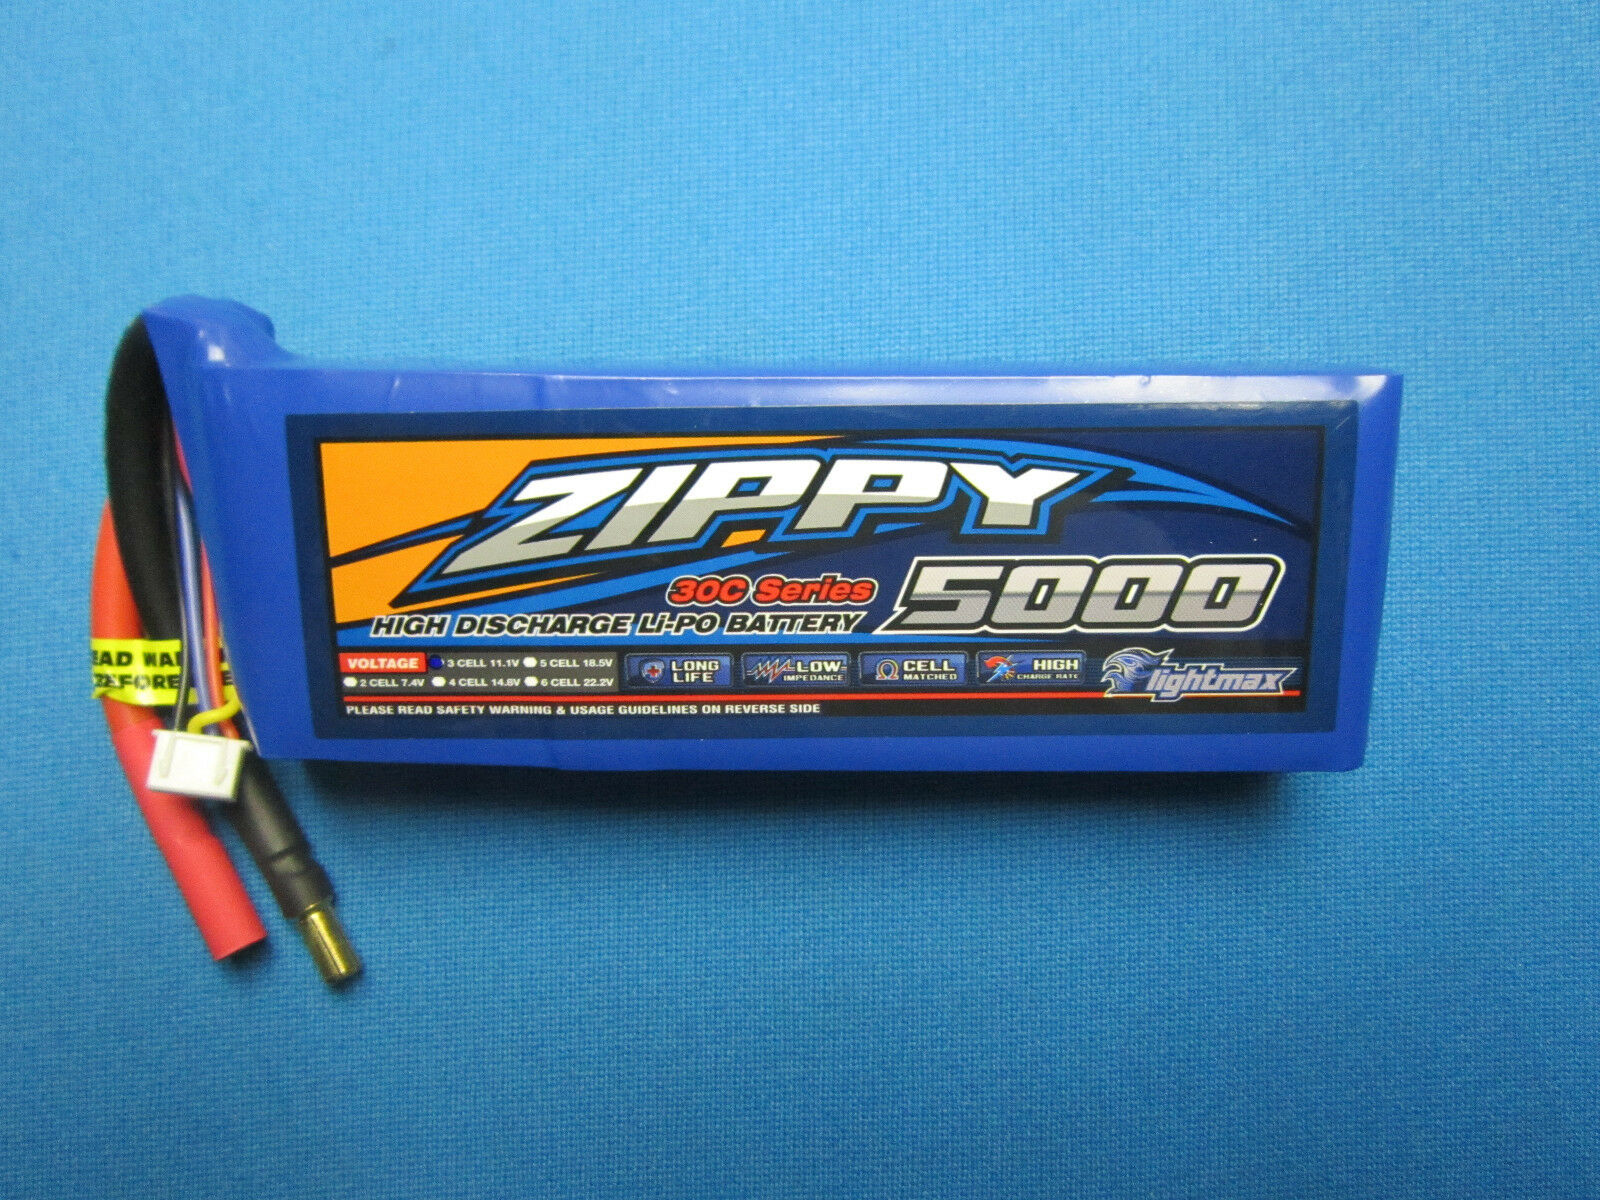 ZIPPY 5000mAh 3S 11.1V 30C 40C LIPO BATTERY 5.5MM BUGGY TRUC